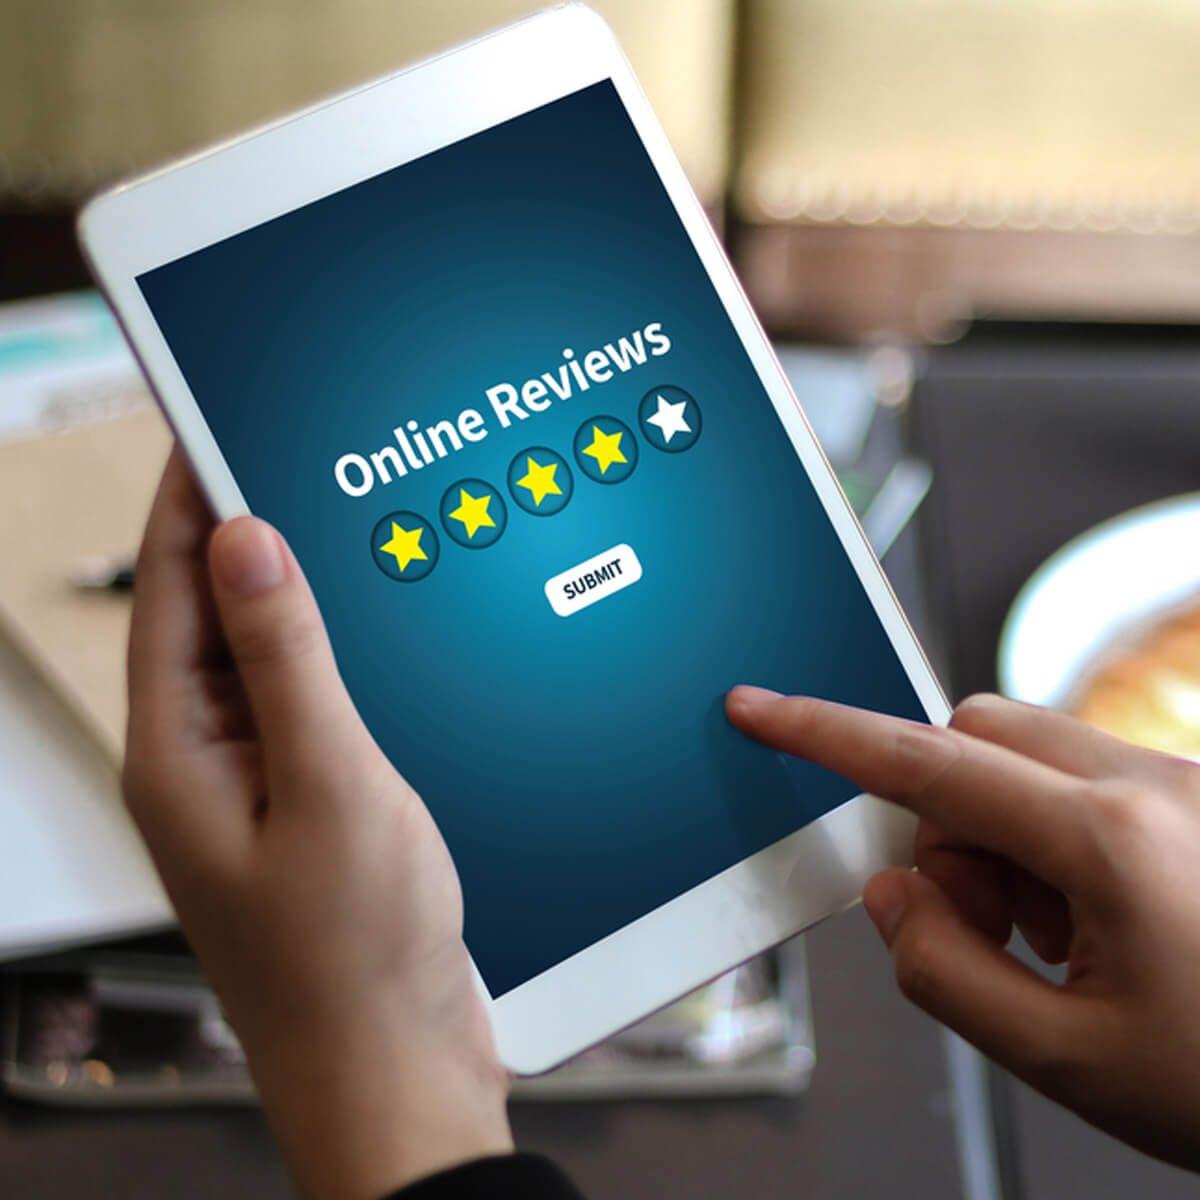 Look at Online Reviews